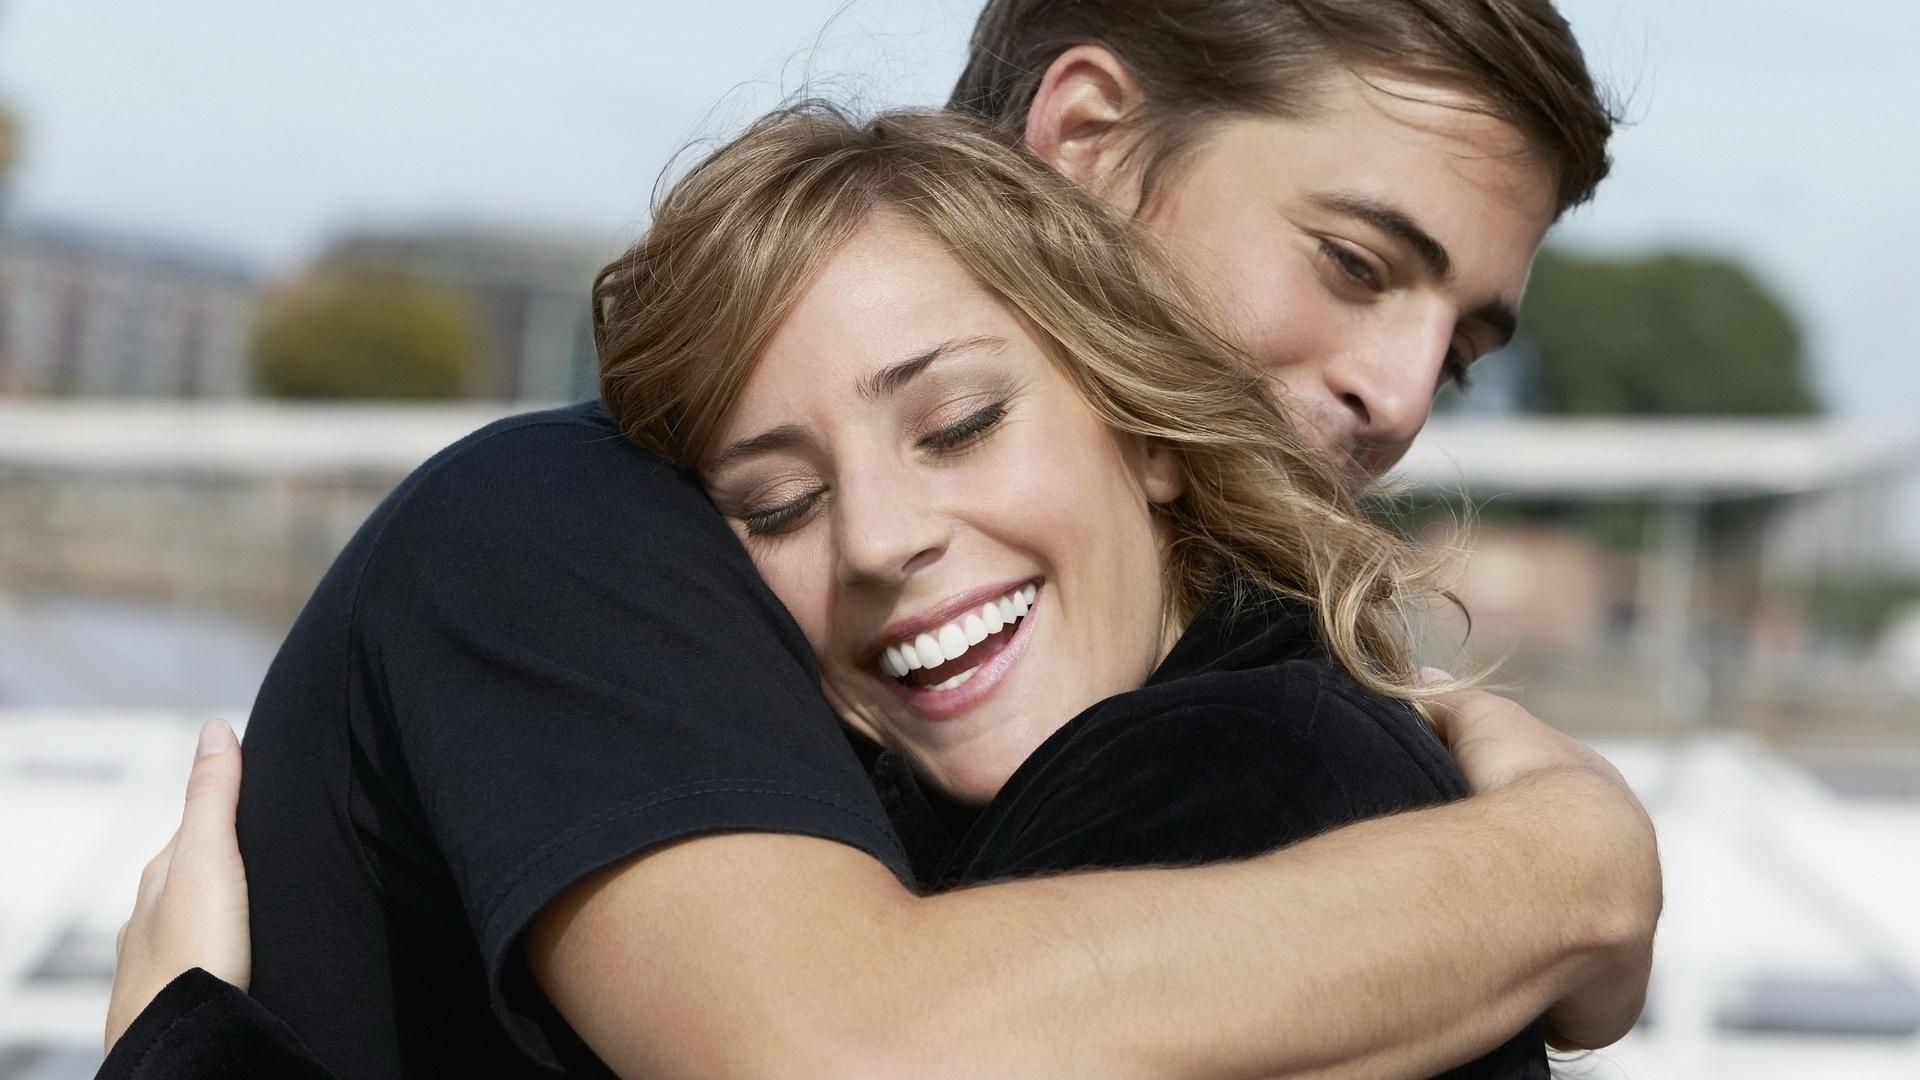 couple_love_happiness_smile_hug_25676_1920x1080